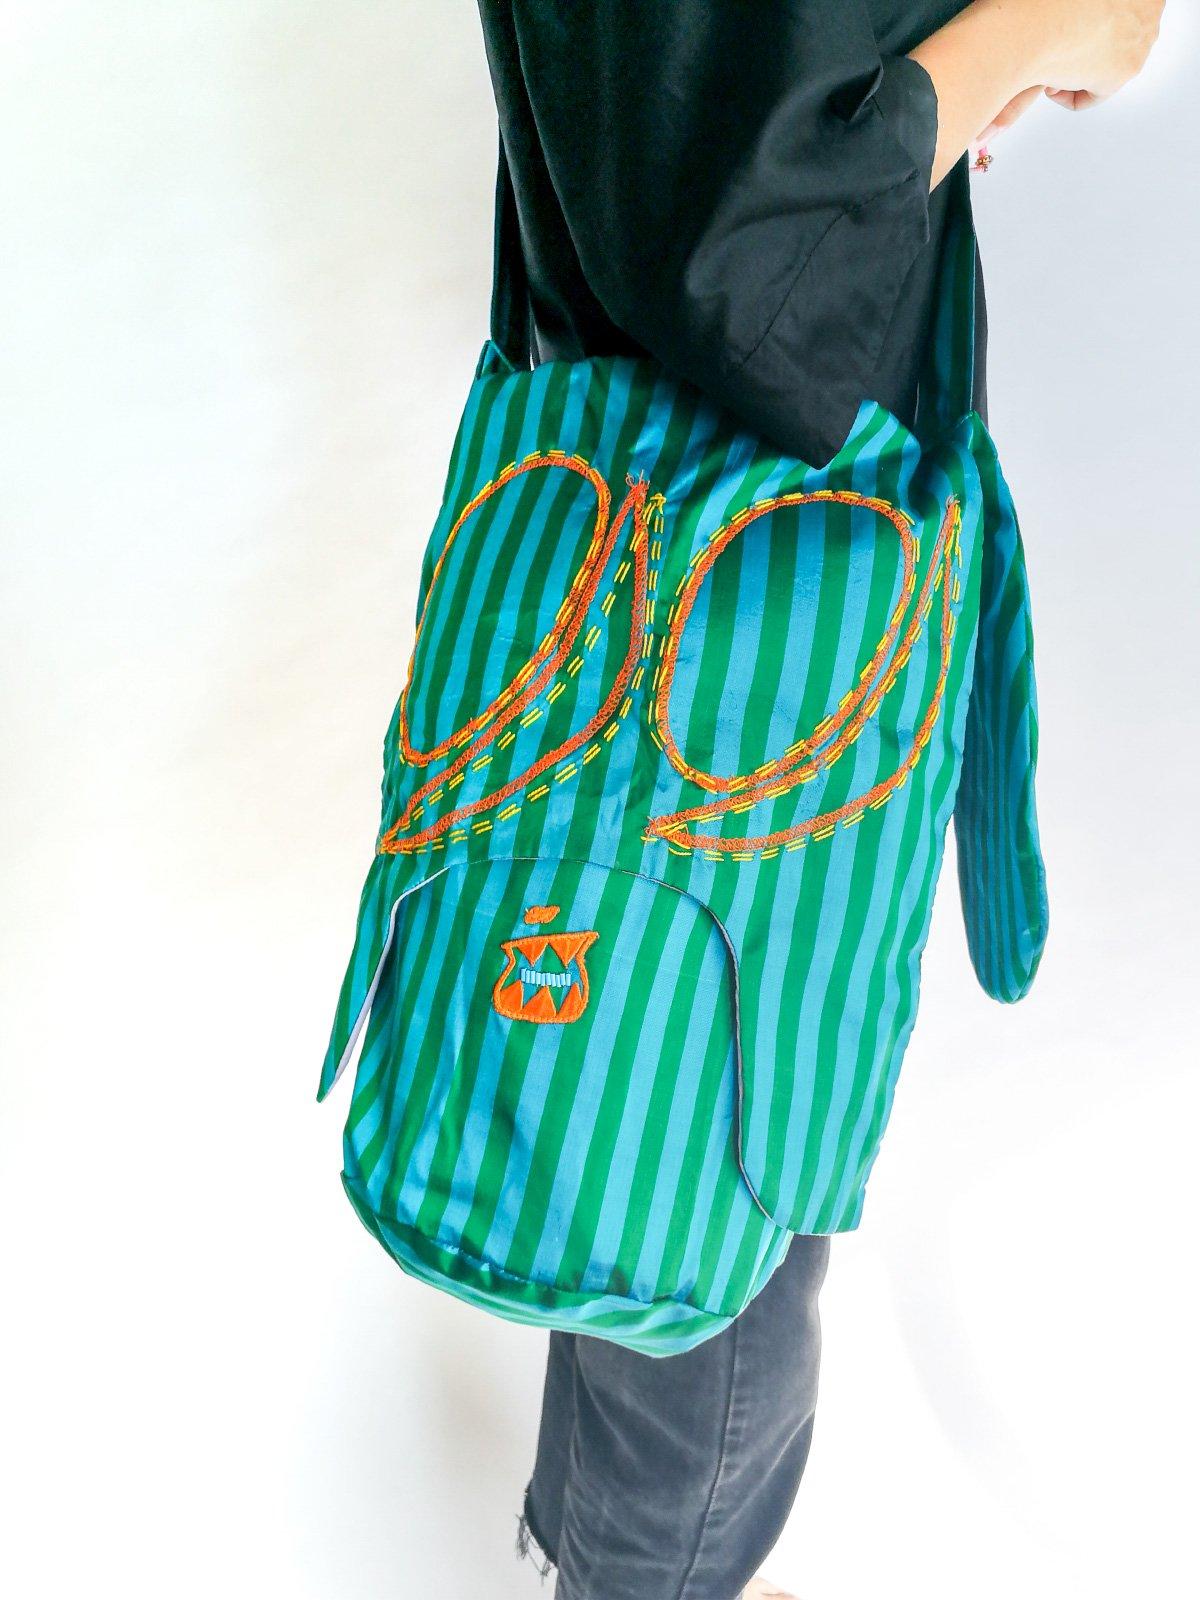 Skoloct Bag (hand stitch) / green × blue